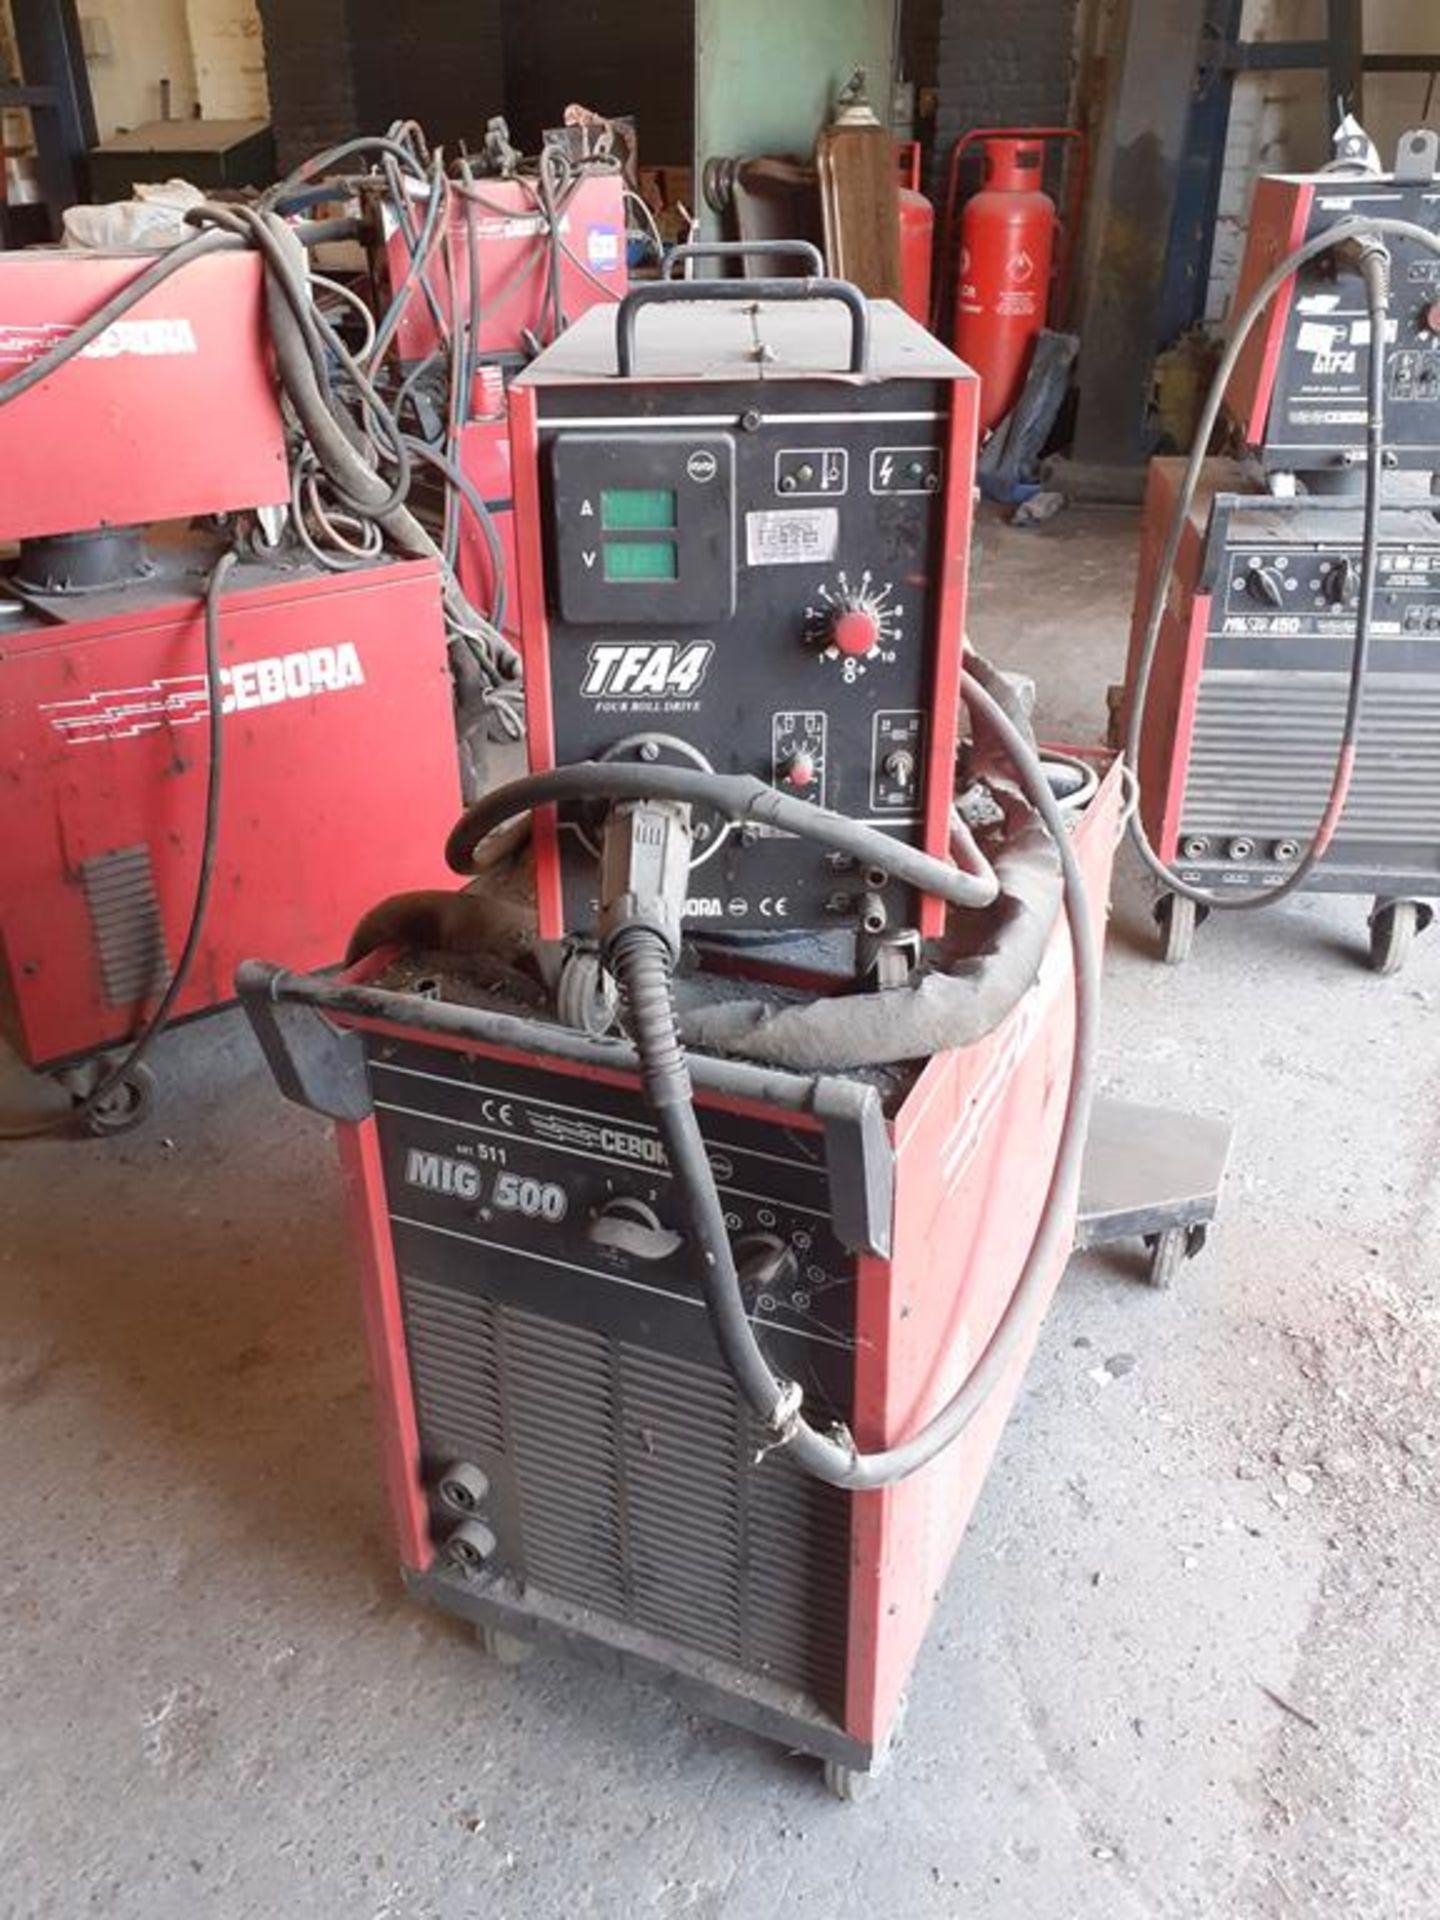 Cebora MIG 500 Mig welder